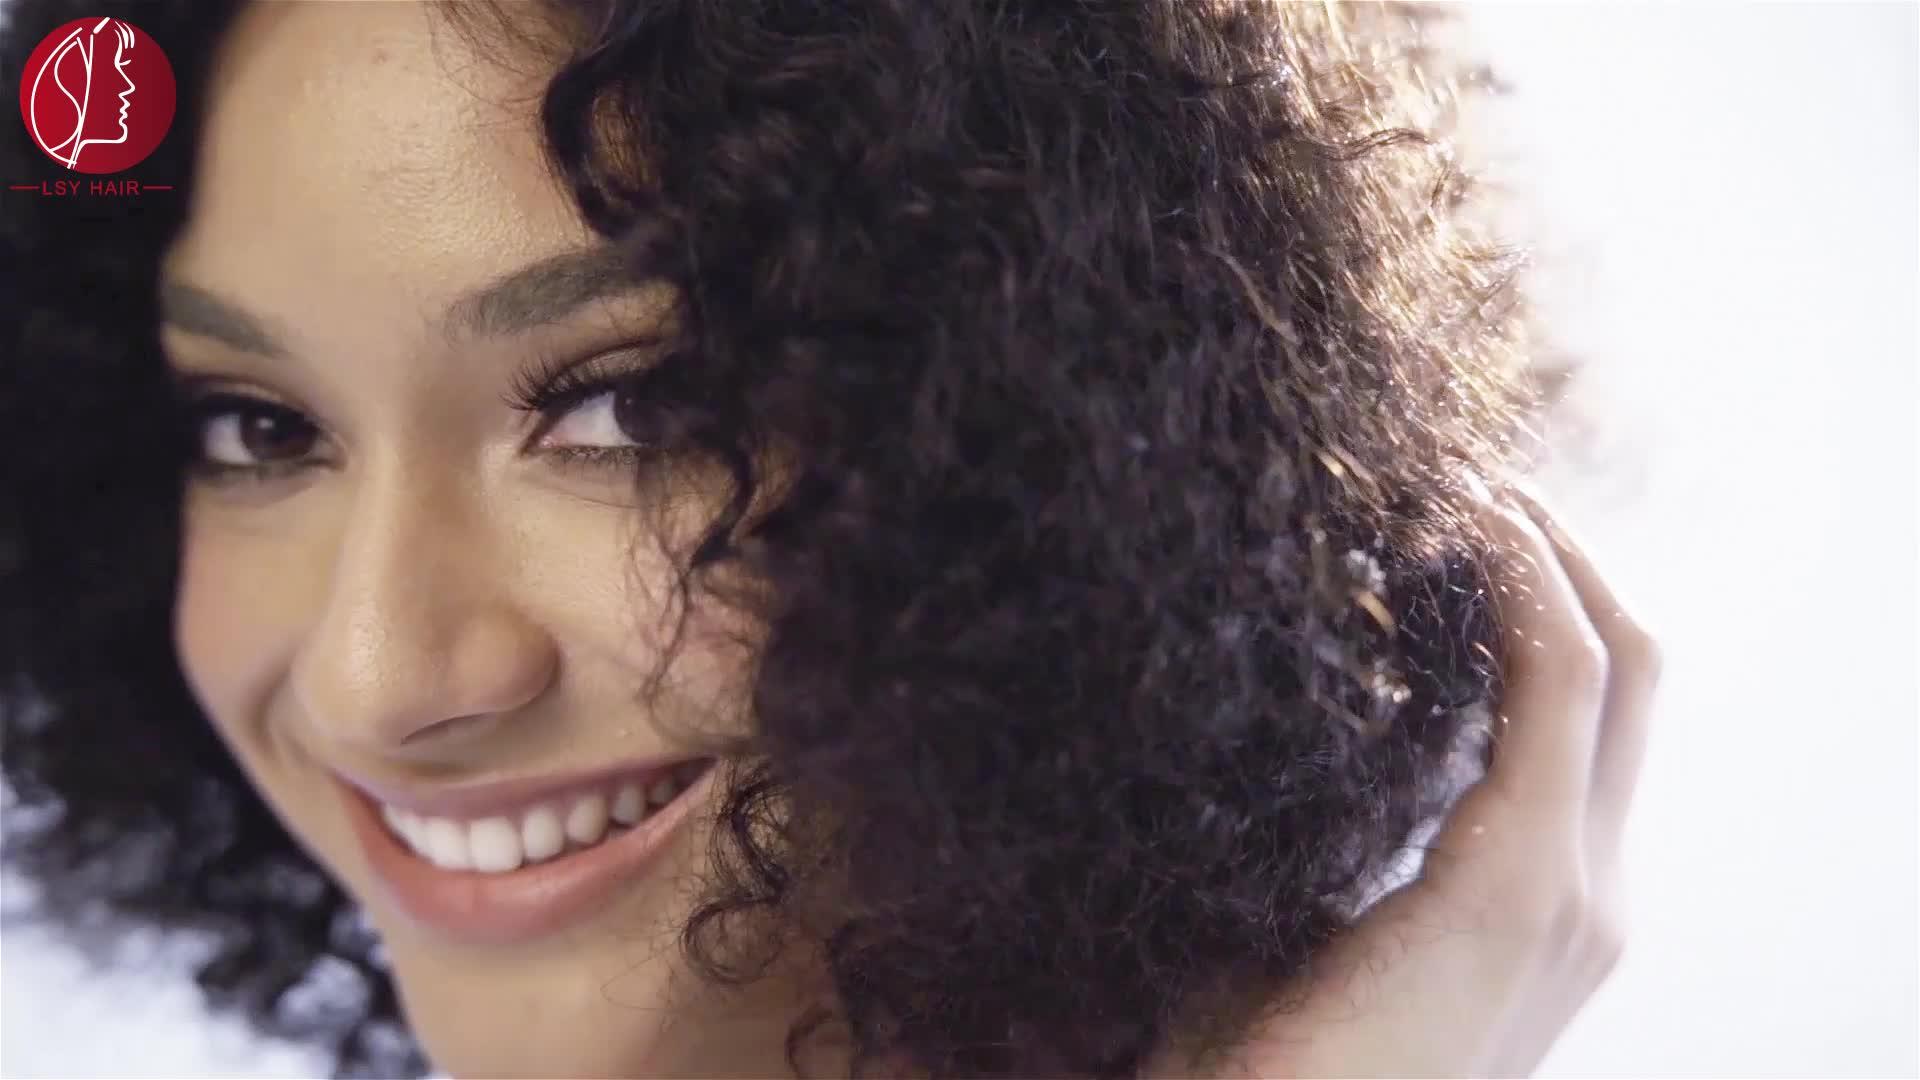 Lsy Groothandel Mongoolse Afro Kinky Krullend Menselijk Haar Weave Clip In Hair Extensions, braziliaanse Afro Clip ins 7 pcs 8 stuks Per Set